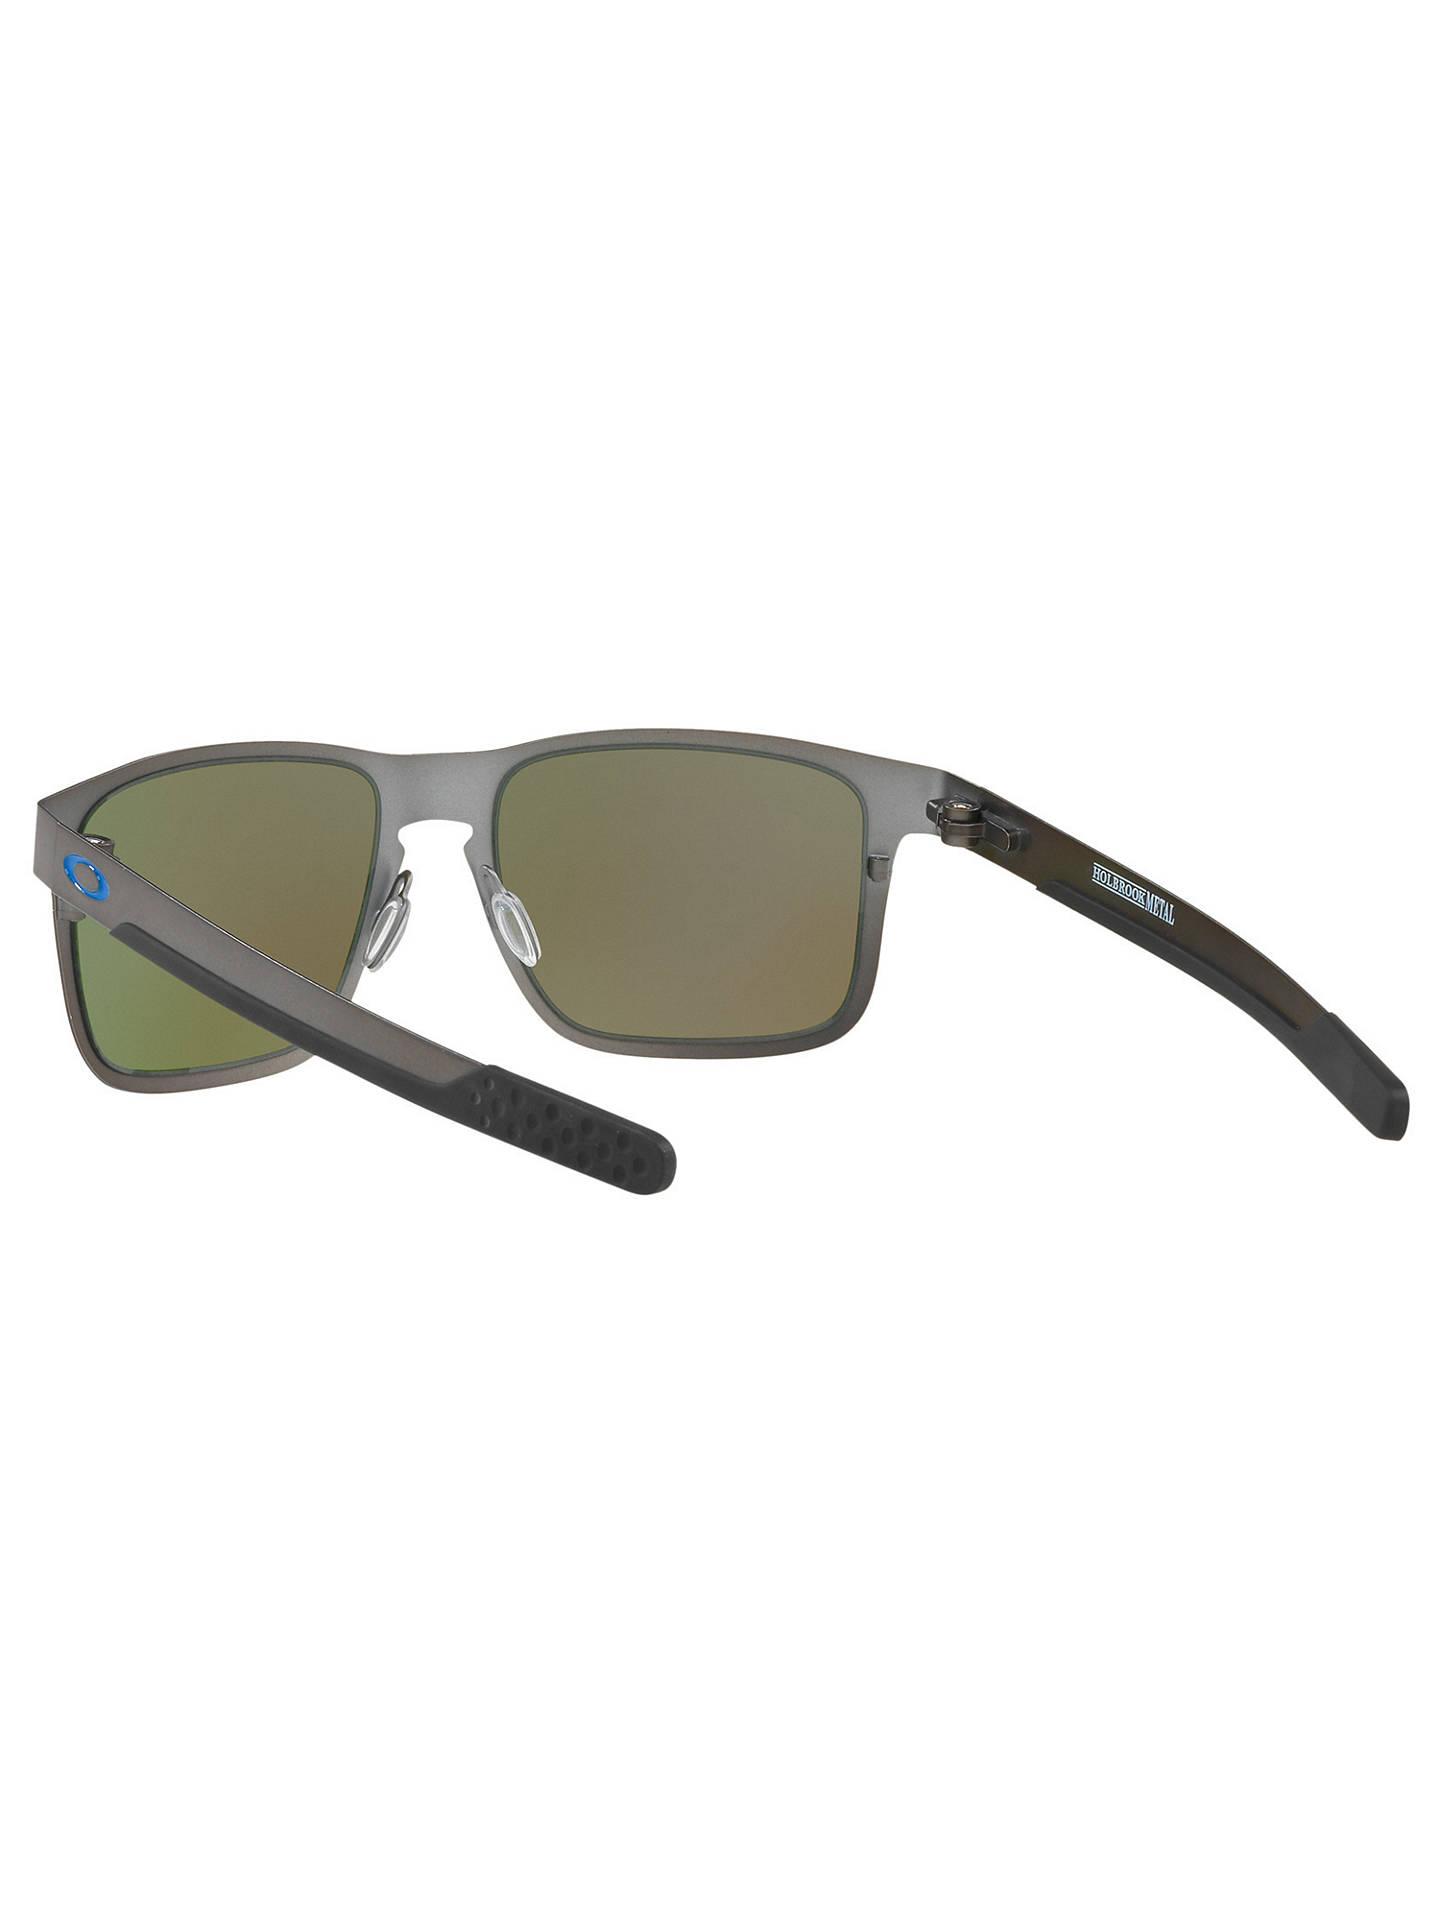 6484d1b717 ... BuyOakley OO4123 Men s Holbrook Prizm Polarised Metal Square Sunglasses